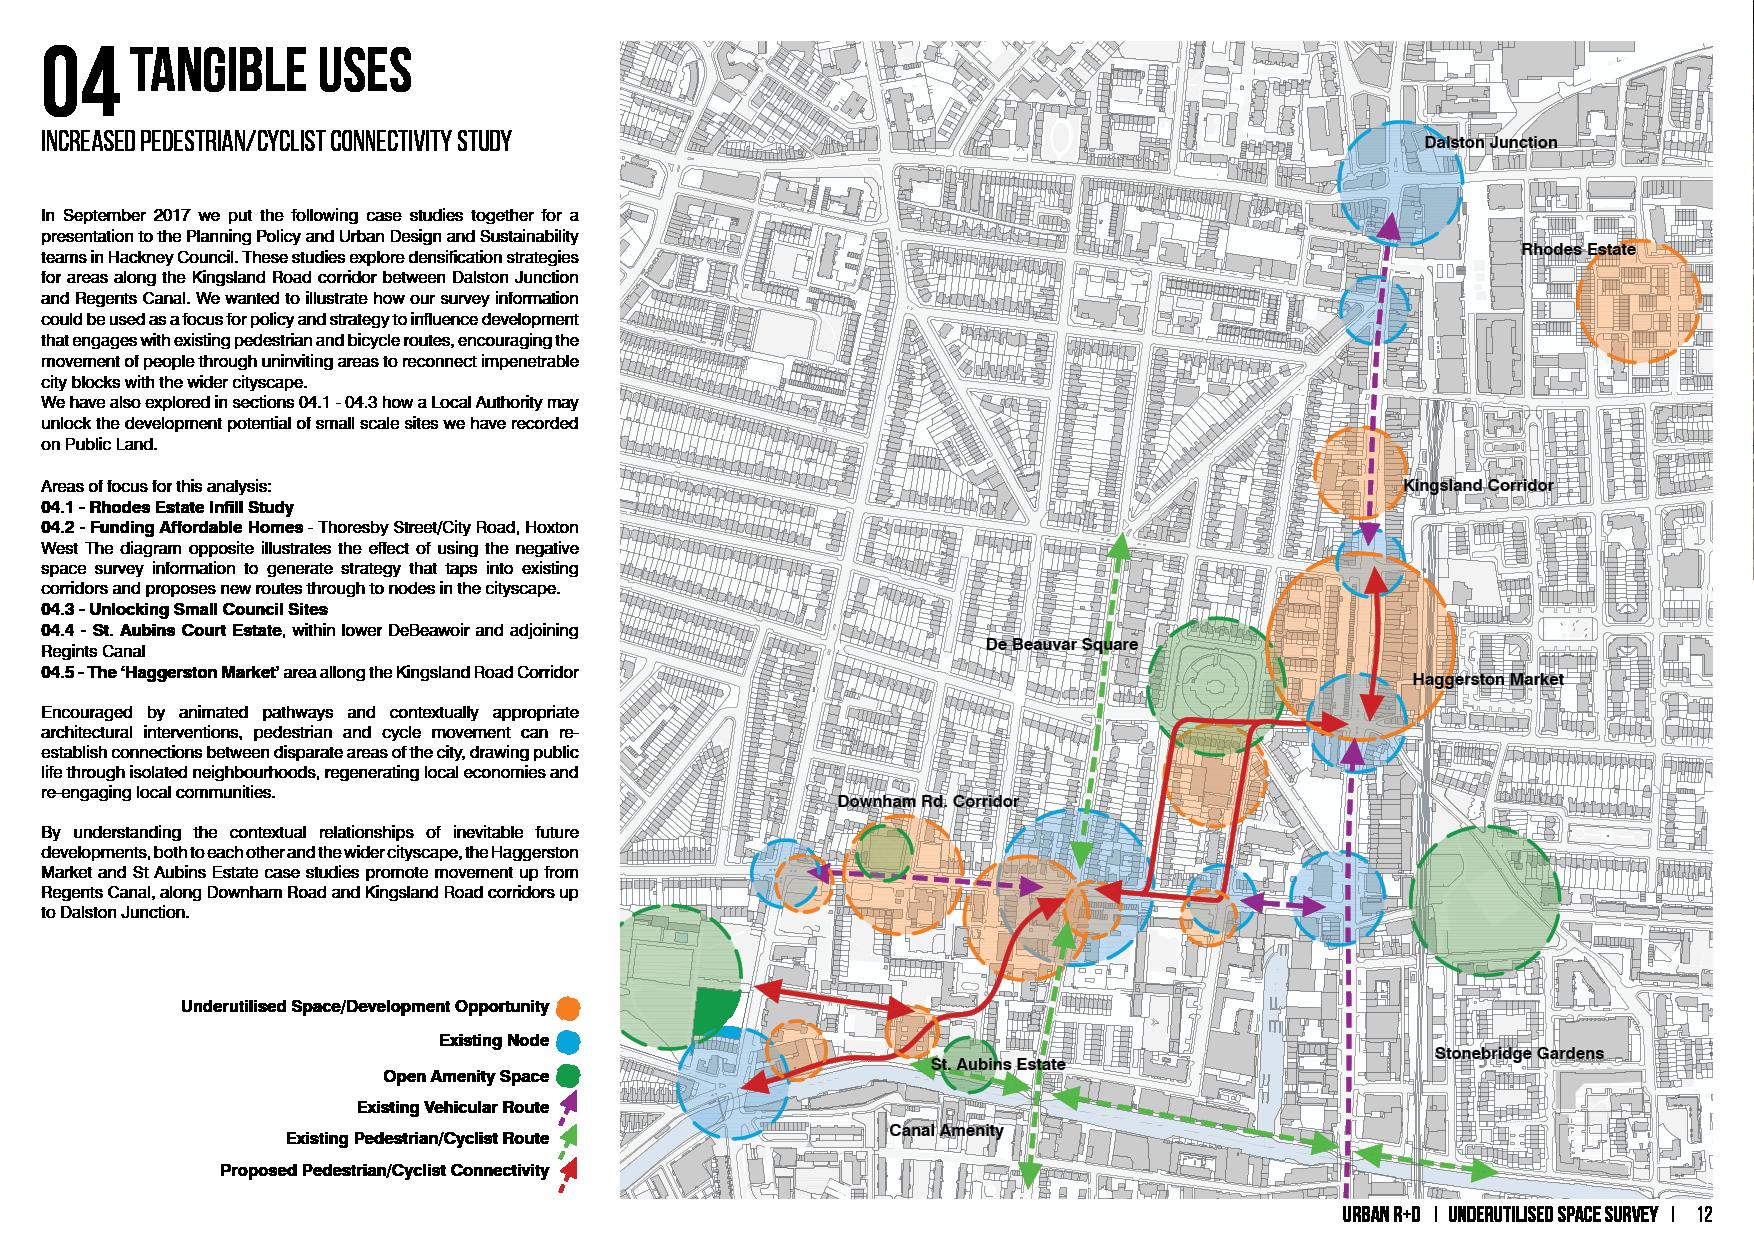 Urban R+D - Underutilised Space Survey12.png